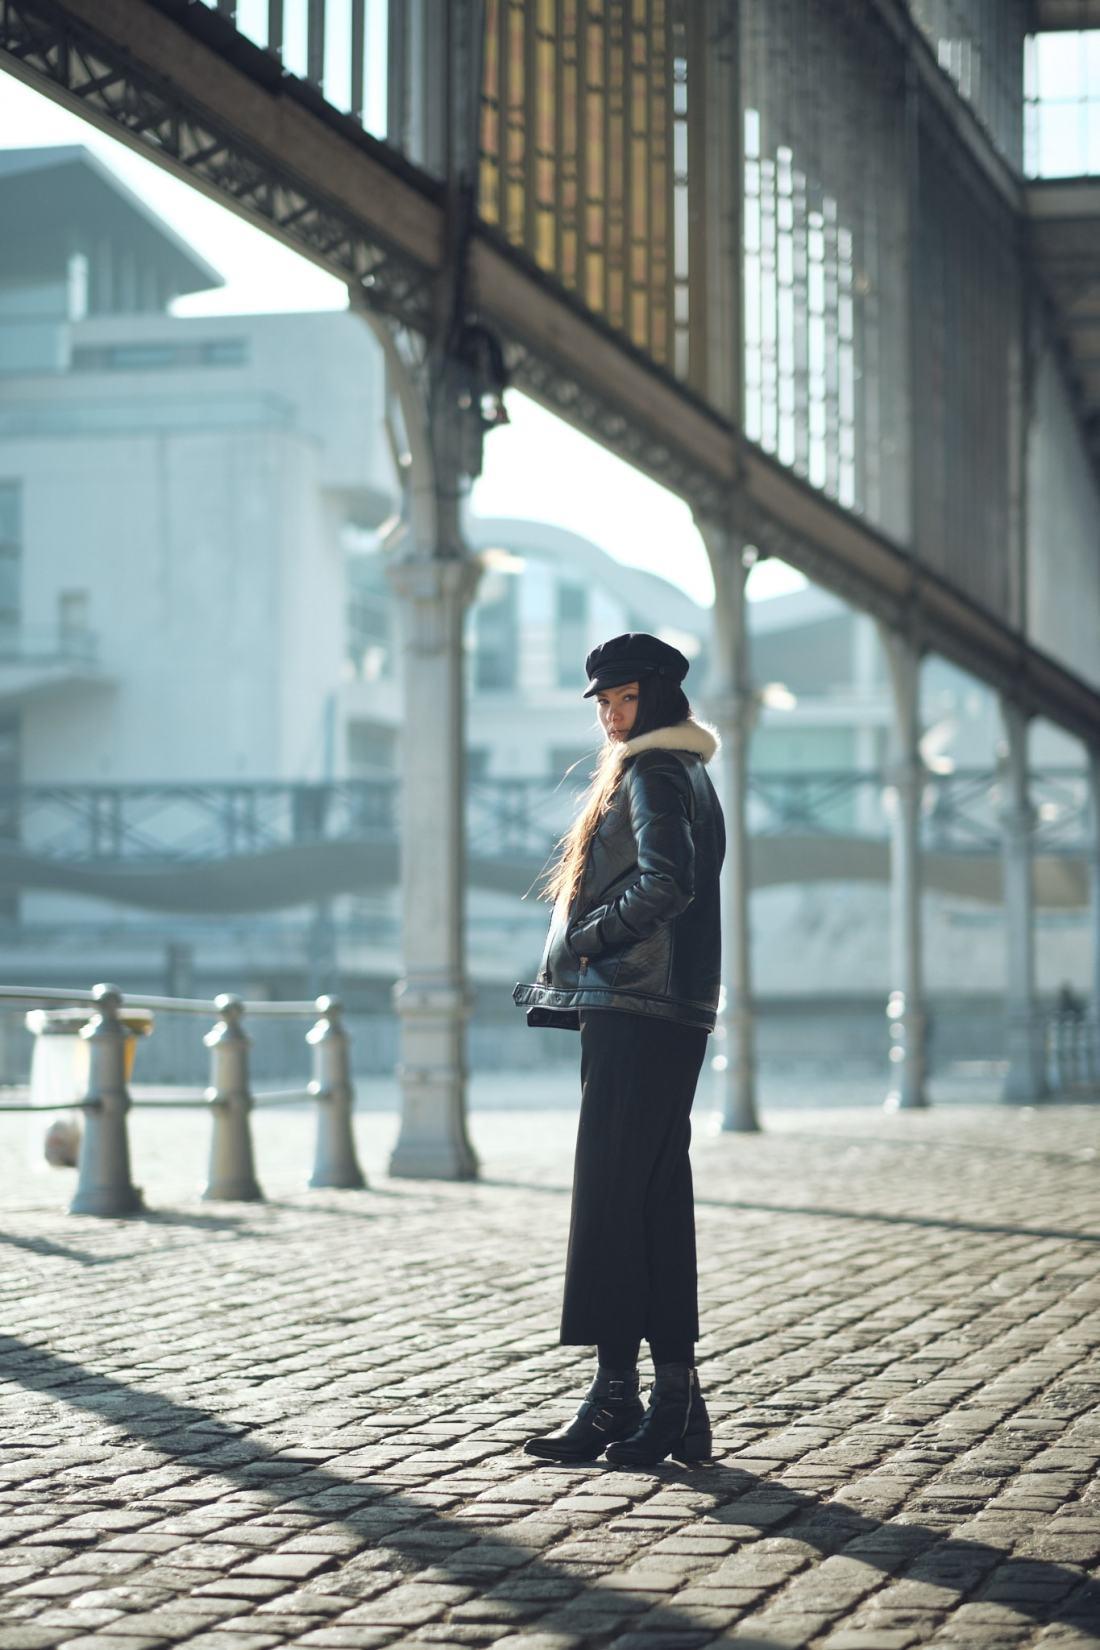 casquette-marin-fashion-blogger-blog-mode-paris-11-min